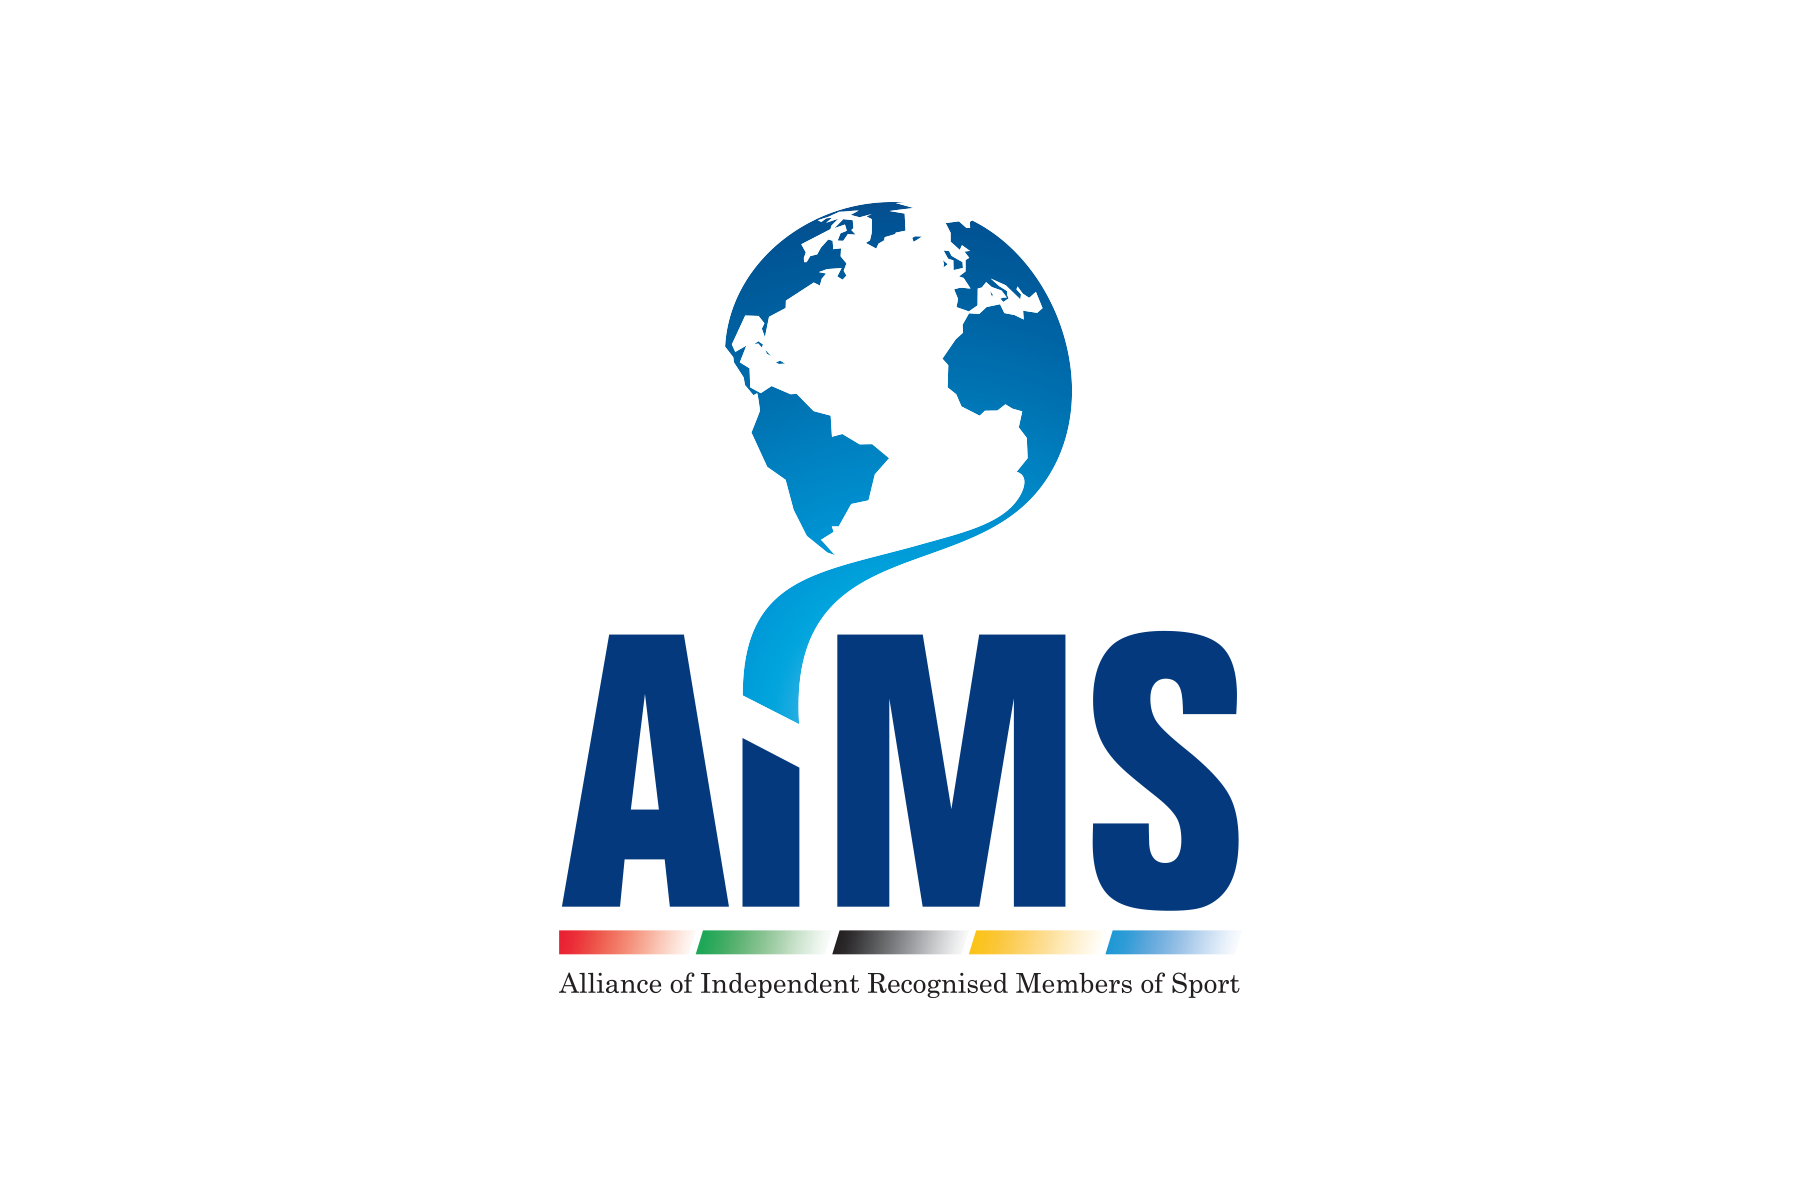 AIMS Council Meeting